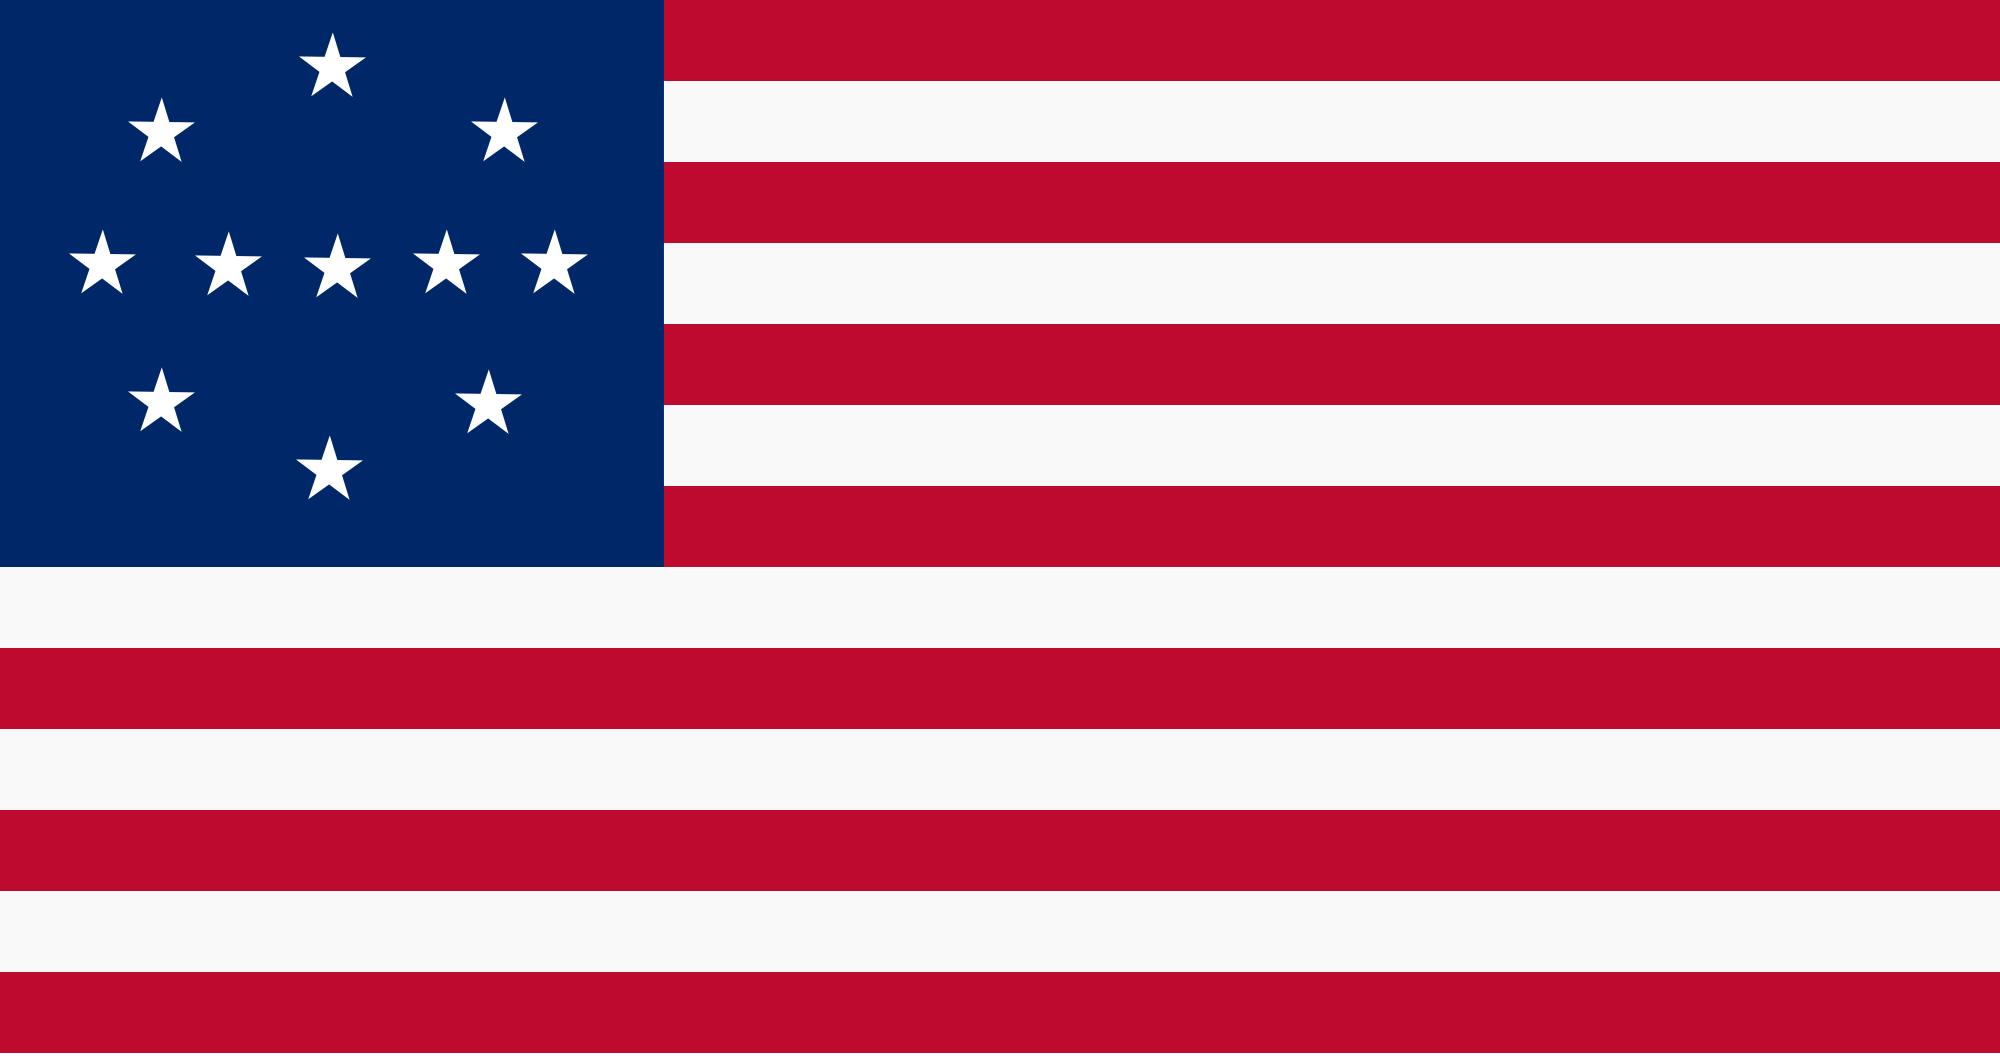 United States (1983: Doomsday)